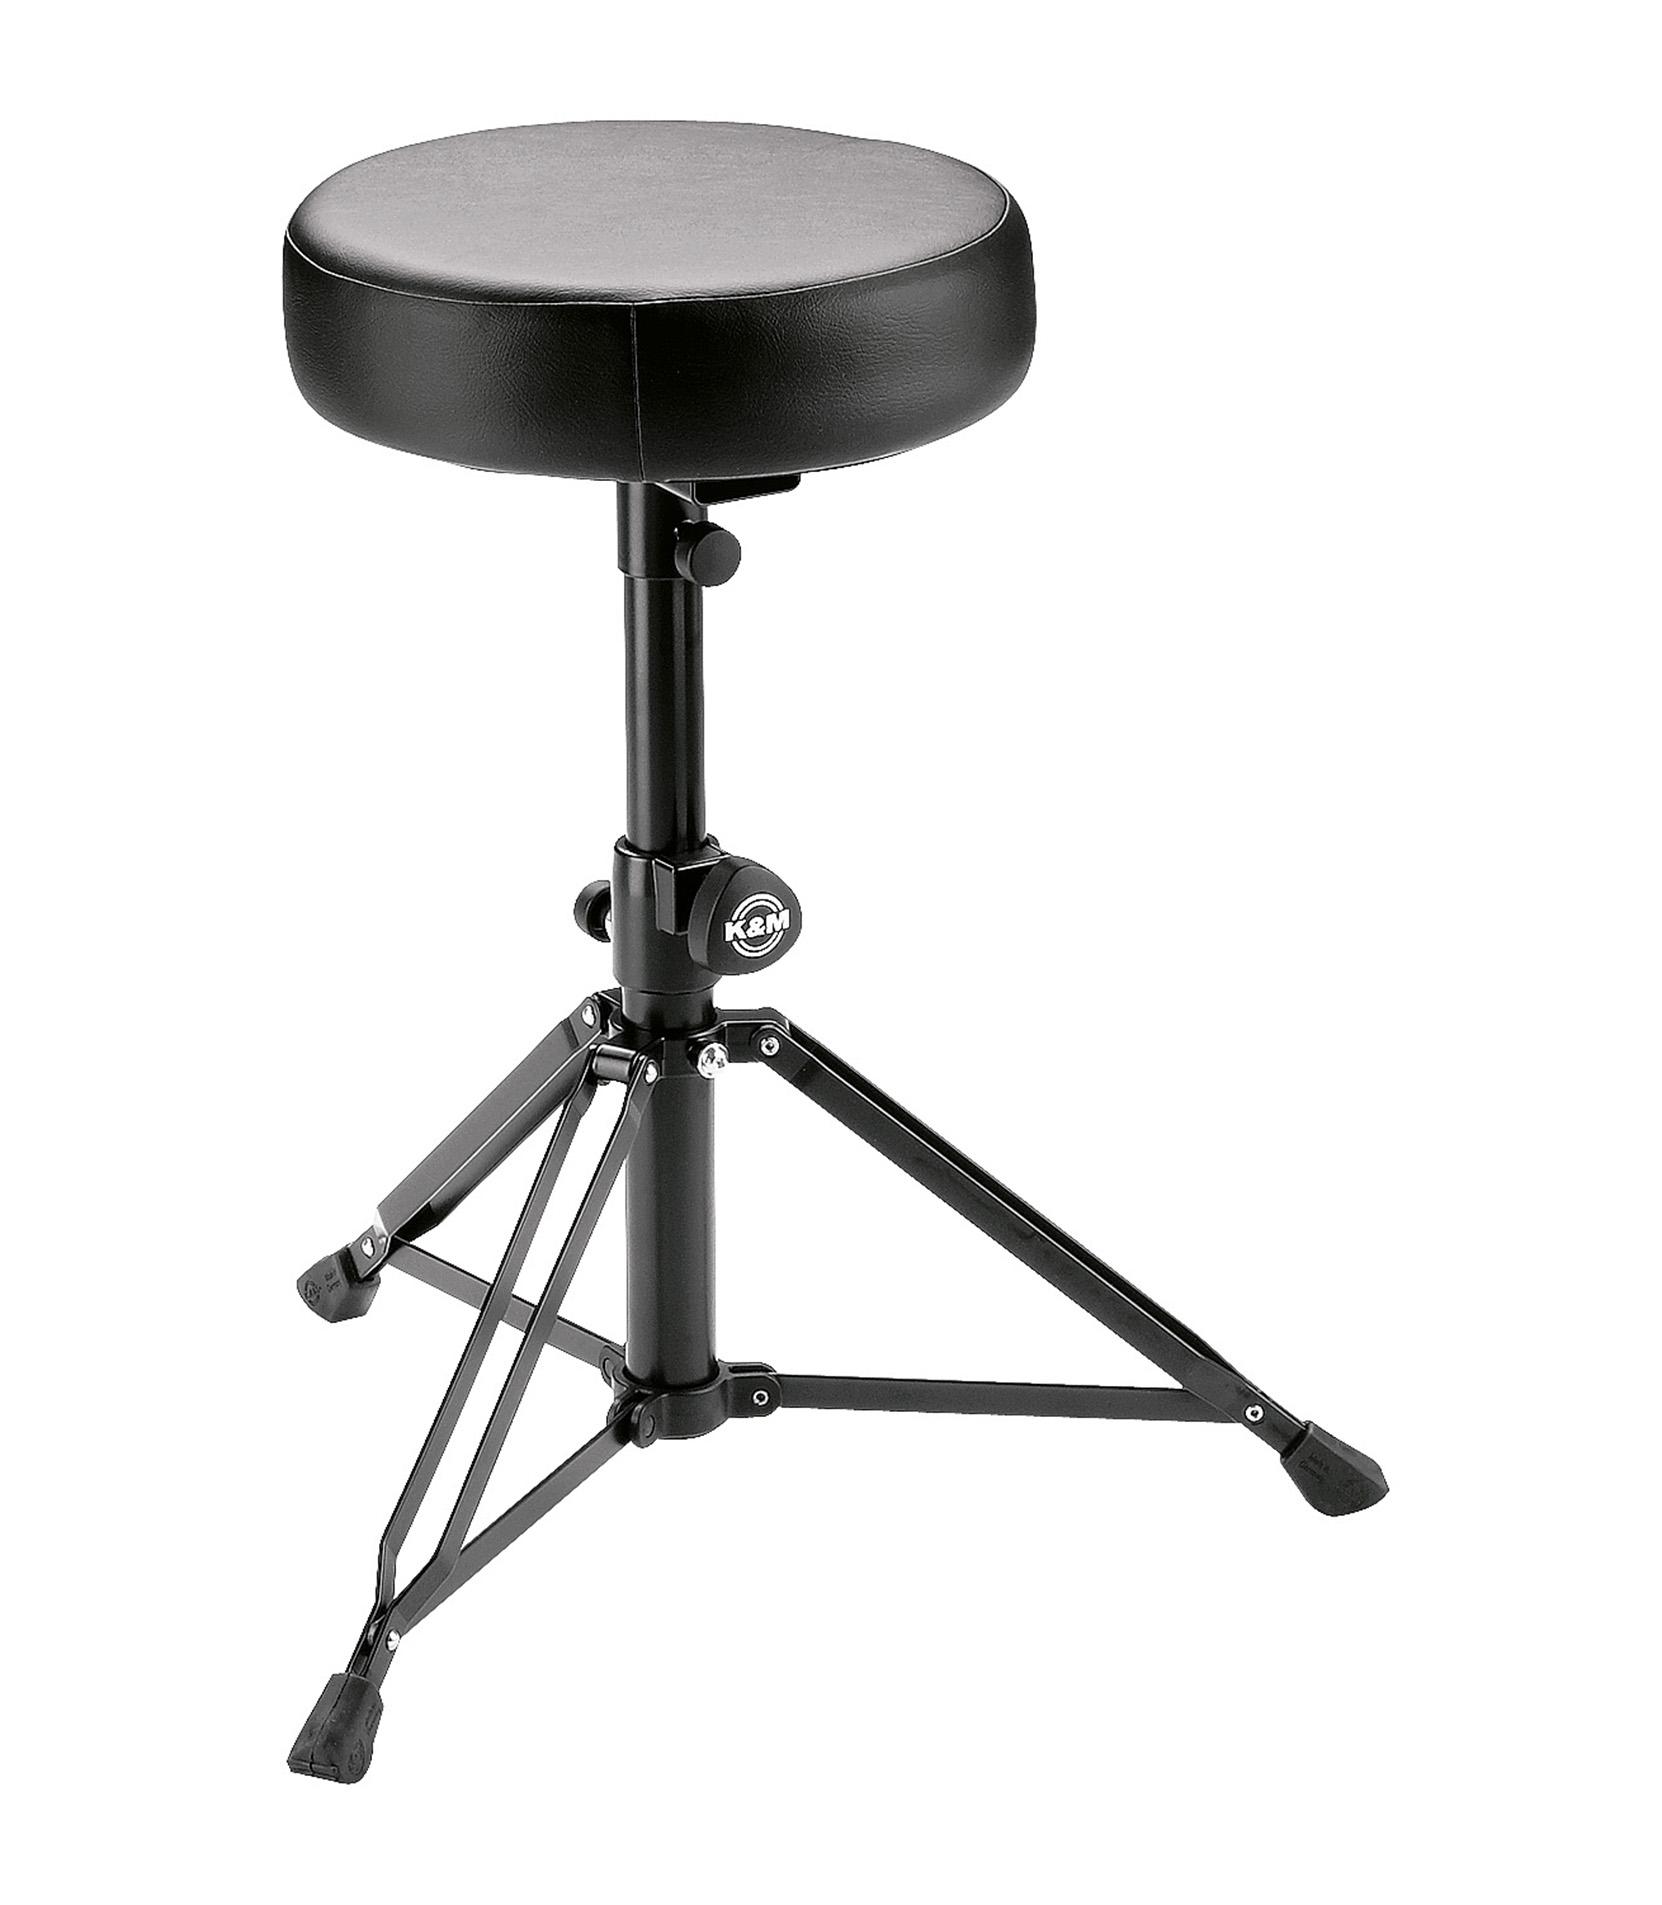 Buy K&M - 14015 000 55 Drummers throneblack leather